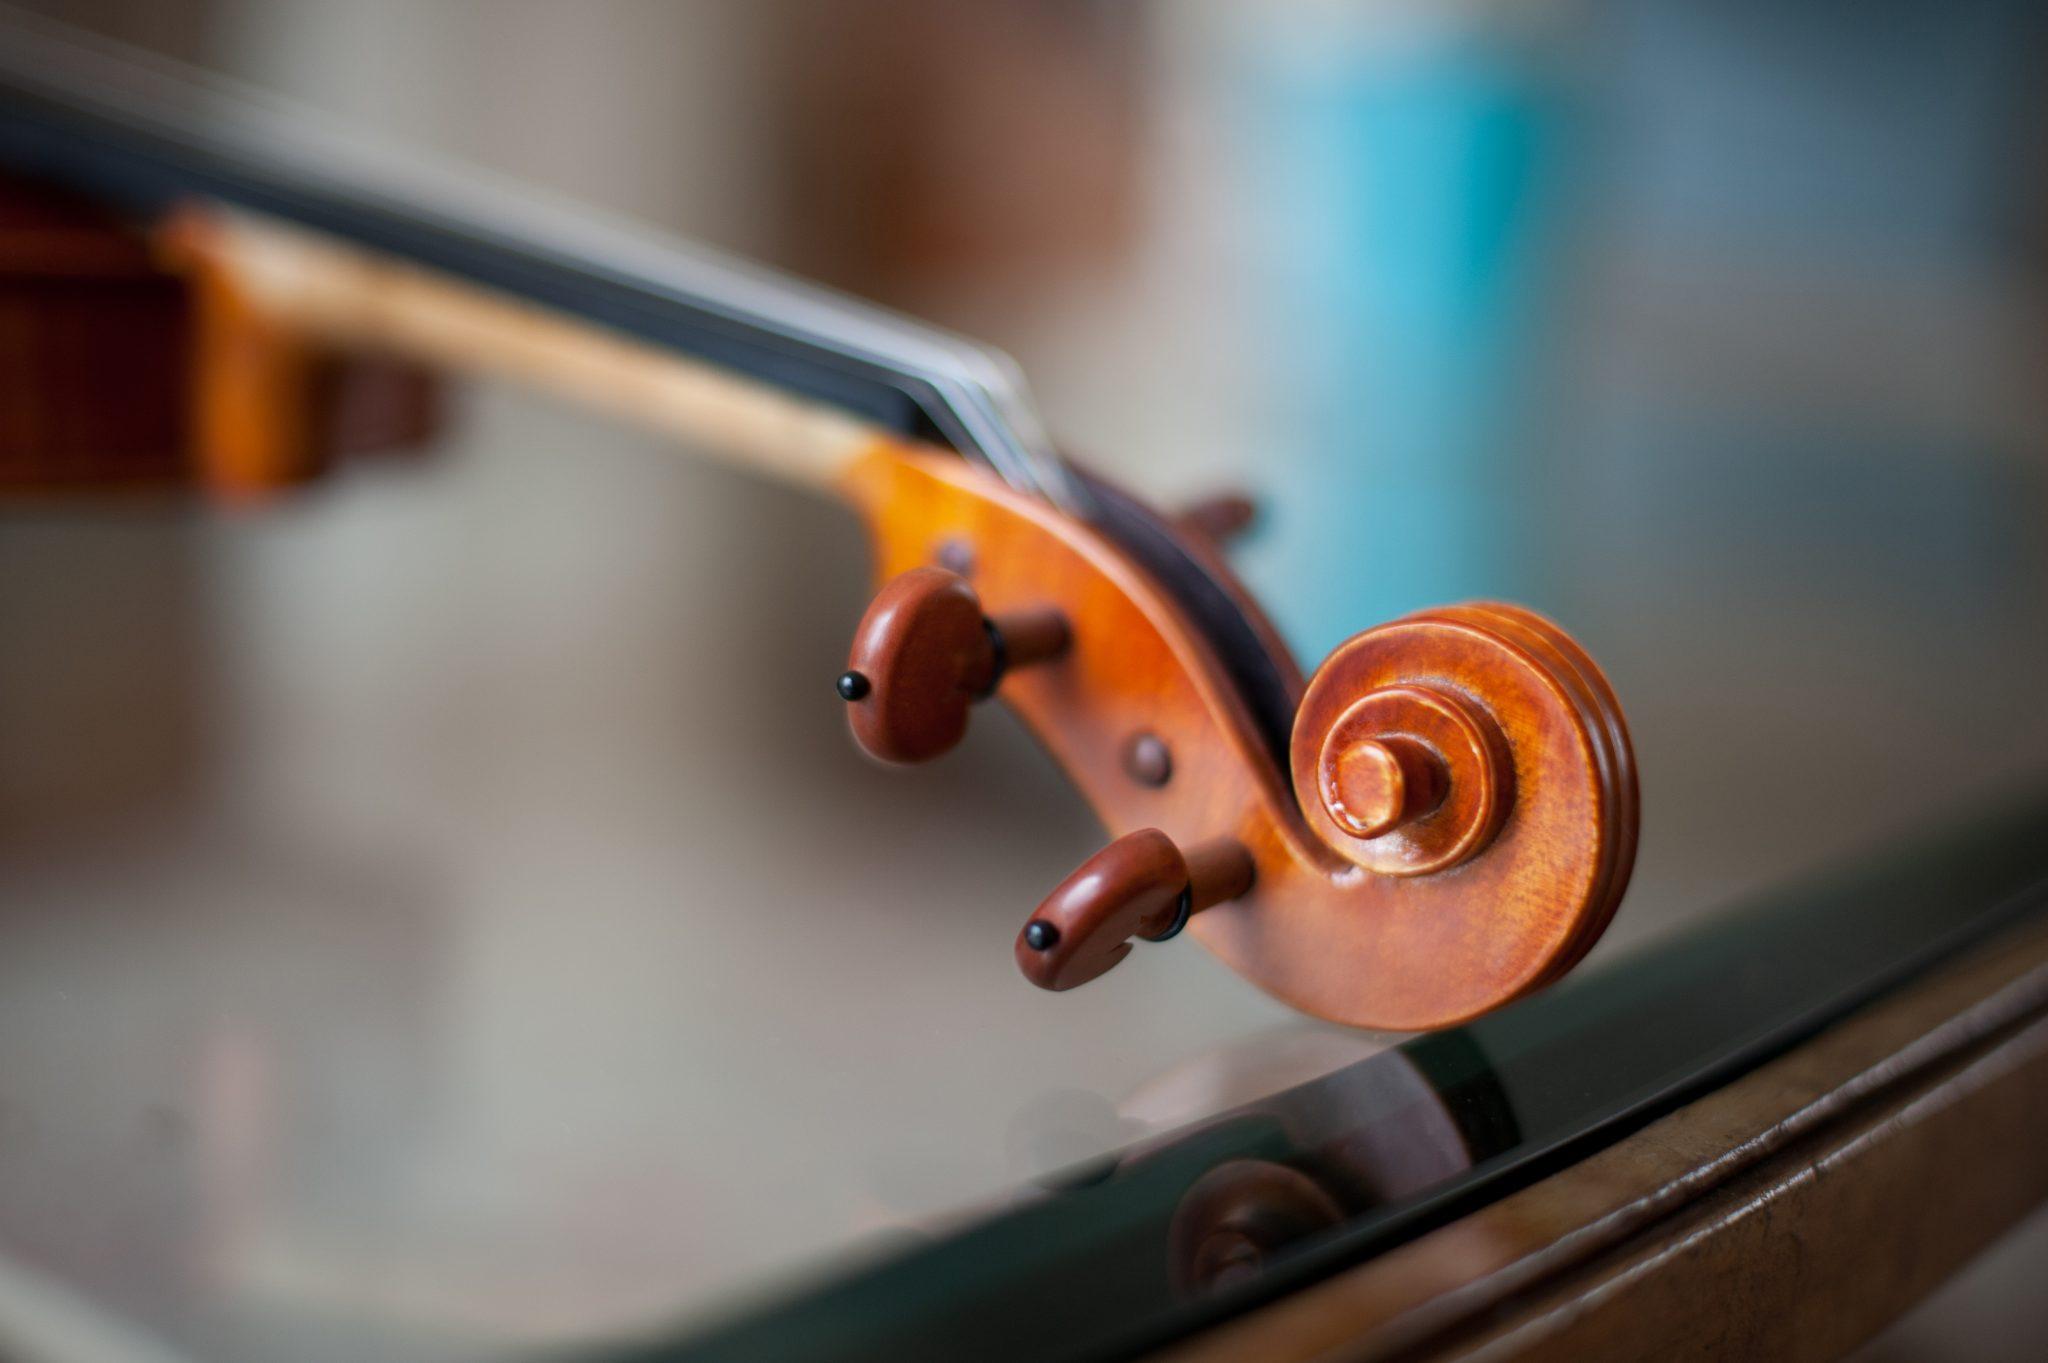 Close-up of a violin scroll